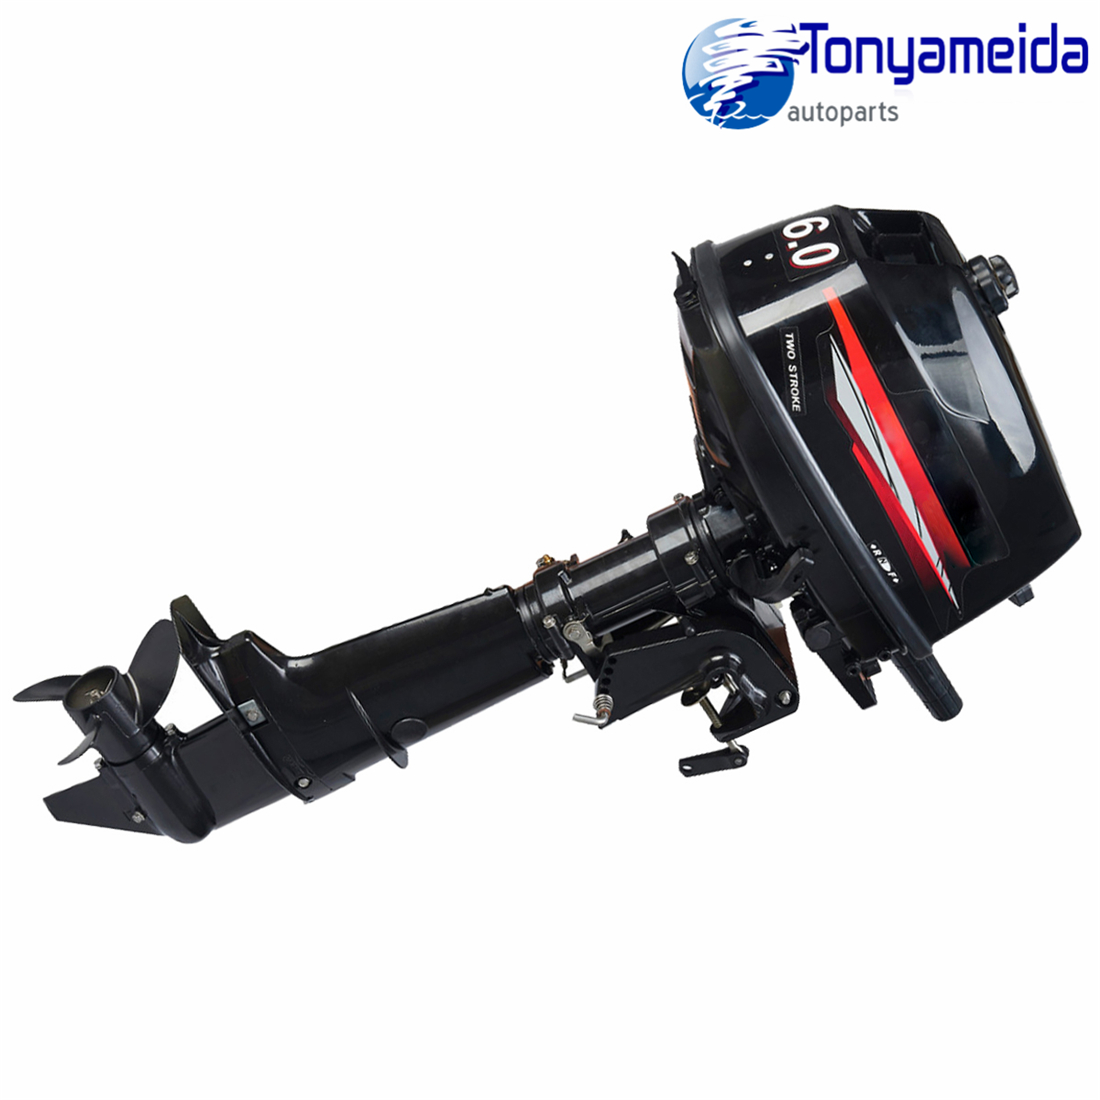 Outboard Motor Tiller Shaft Boat Engine 2 Stroke 6 Hp With Water Cooling System